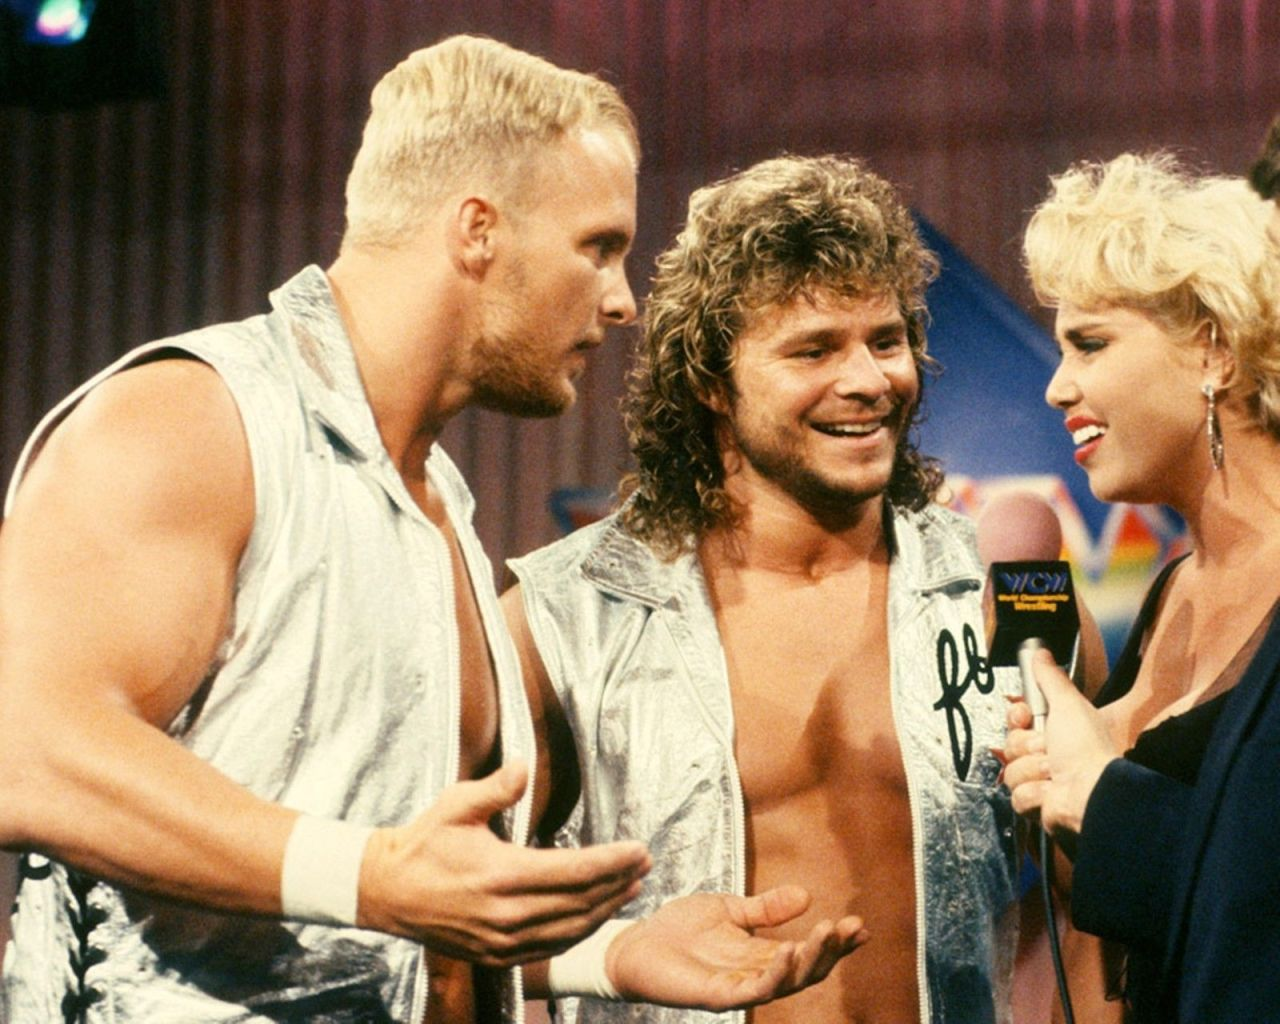 """The Hollywood Blonds"" Steve Austin and Brian Pillman Confront Missy Hyatt"